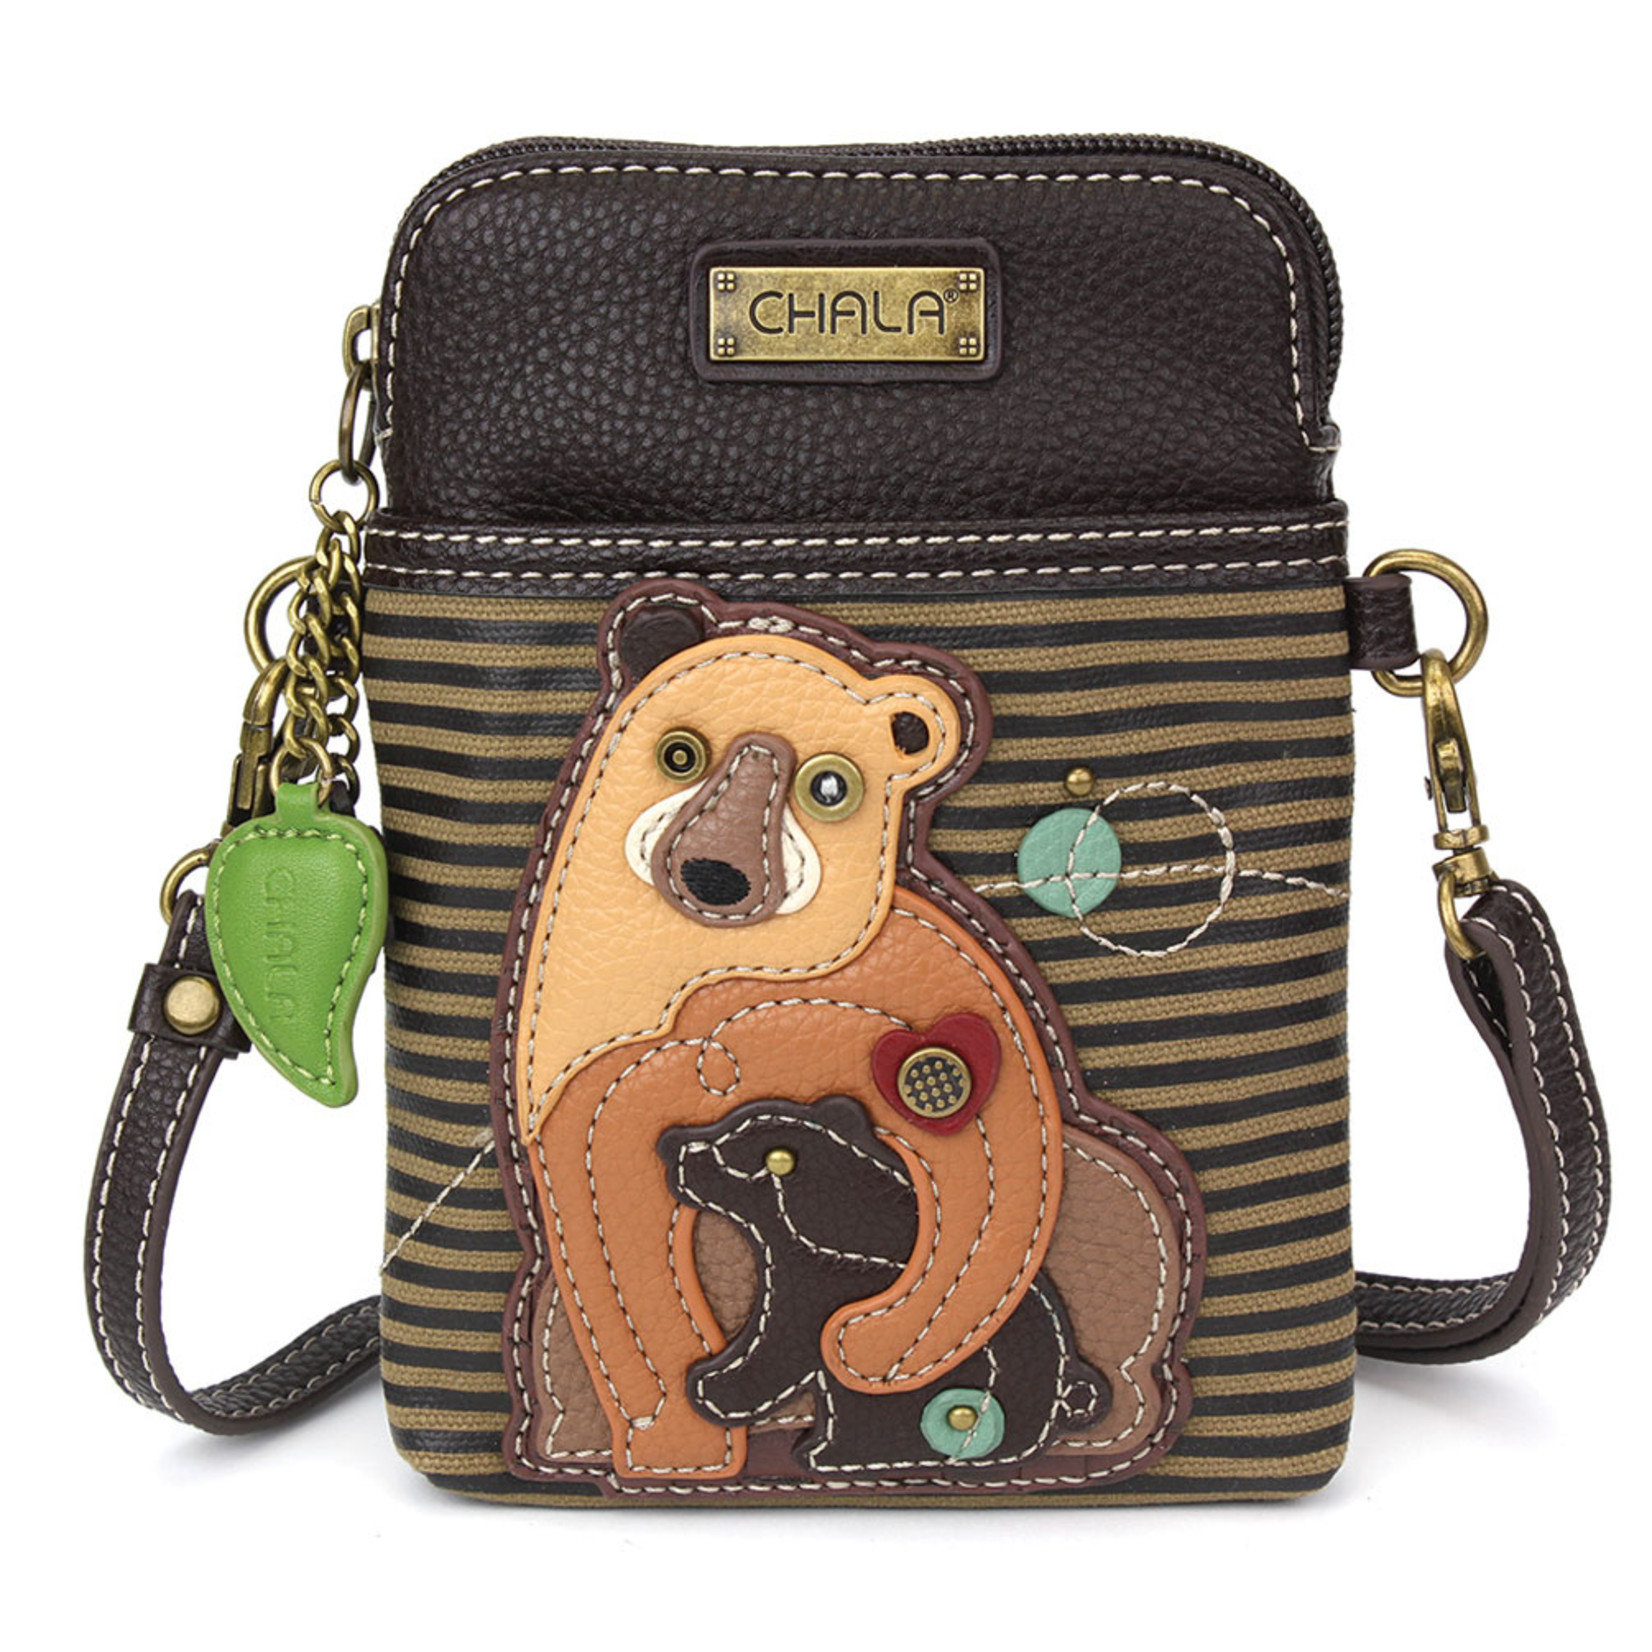 Chala Cell Phone Crossbody Two Bears